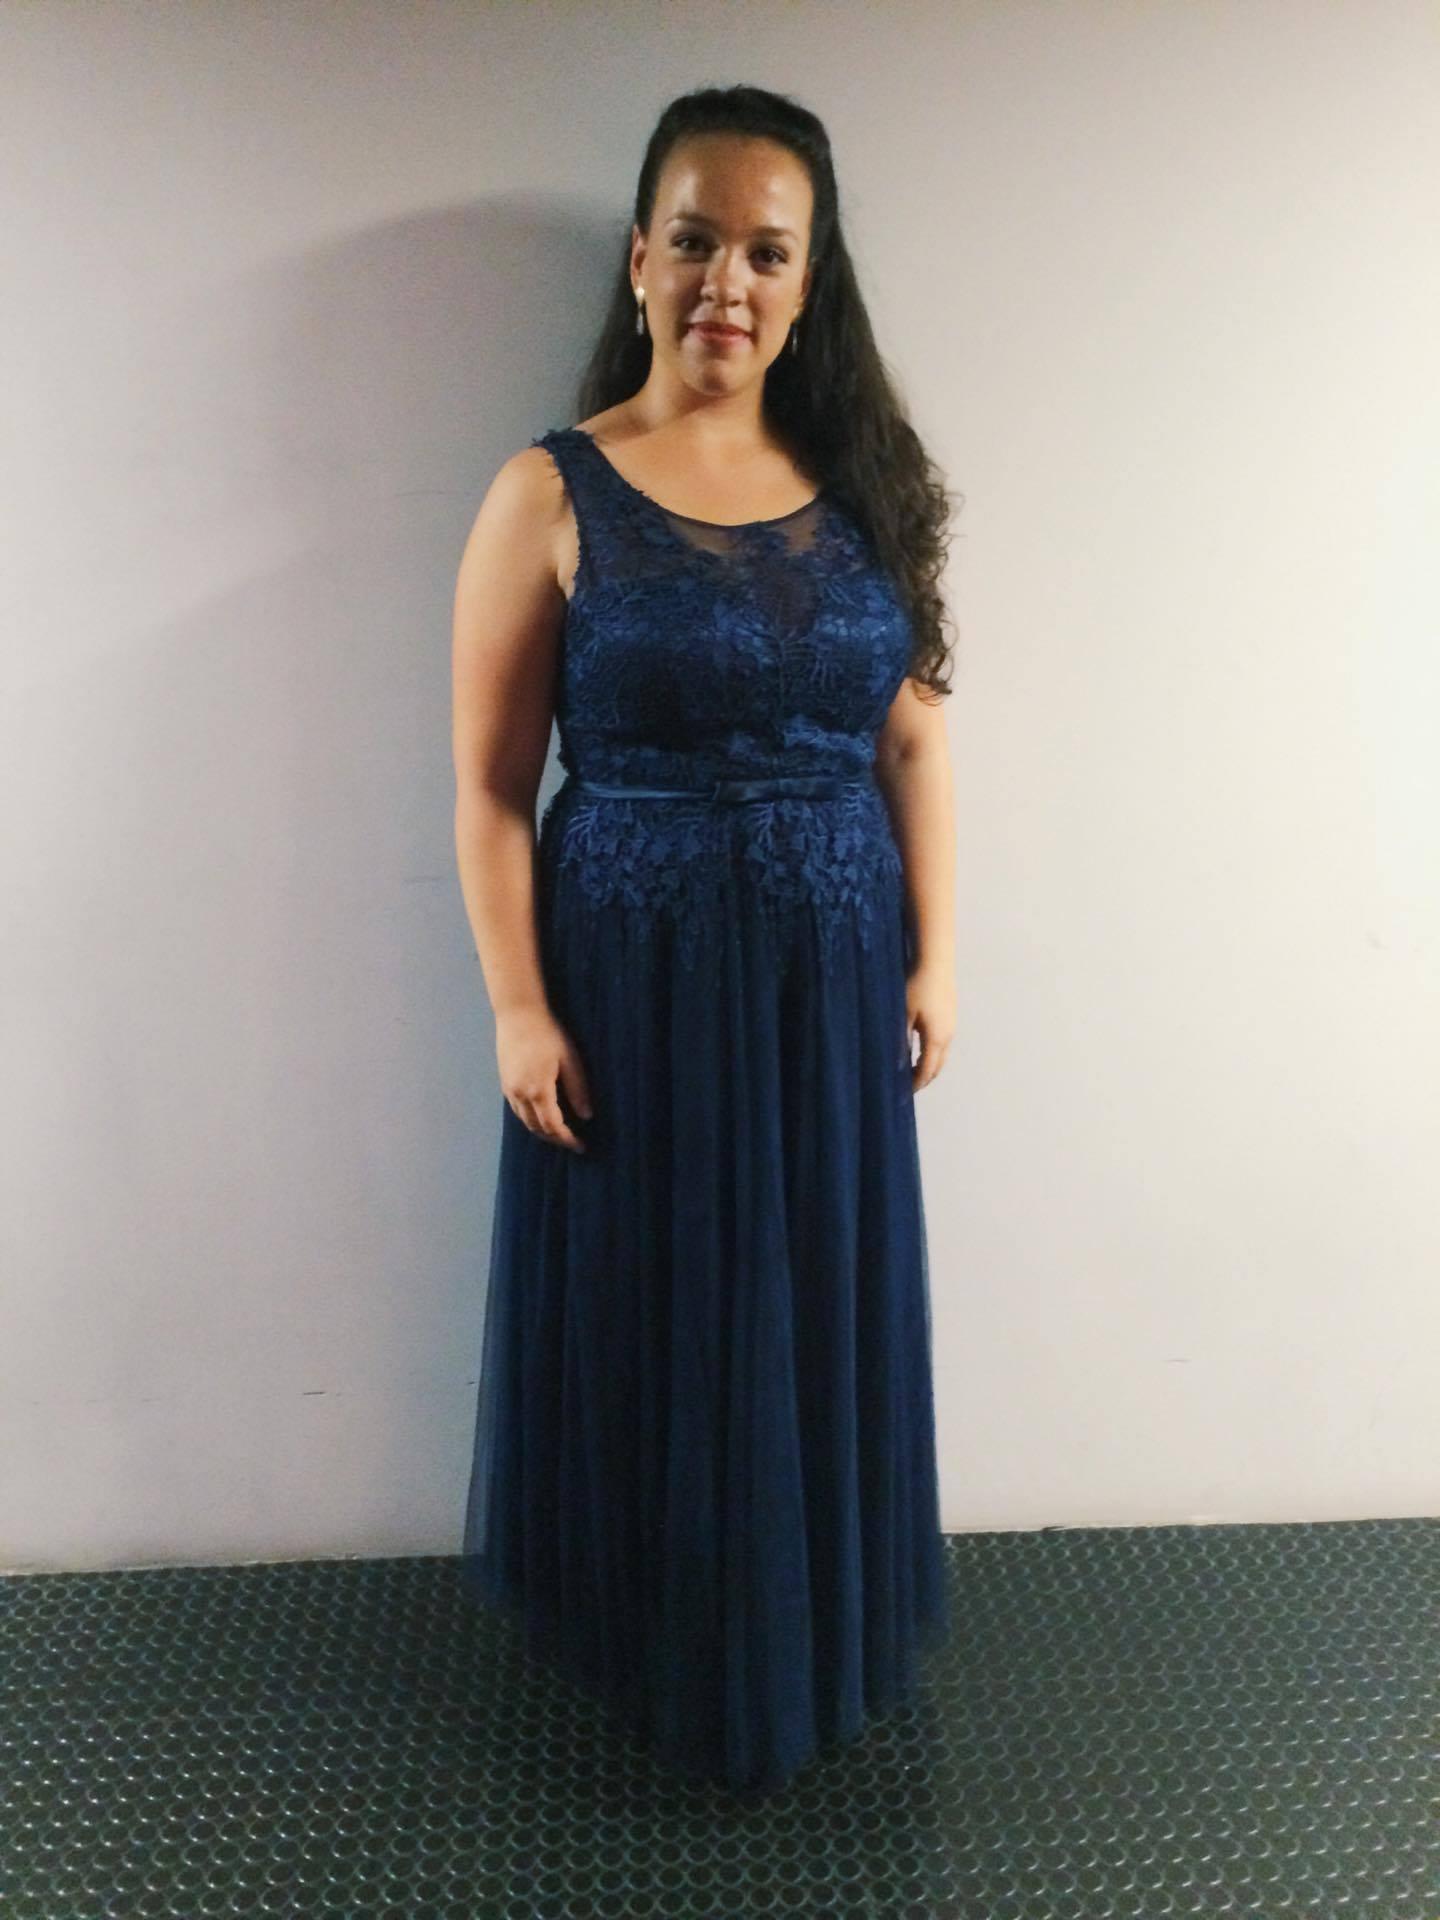 1st Fairy - Midsummer Night's dream by Mendelssohn, Orquestra XXI, 2016